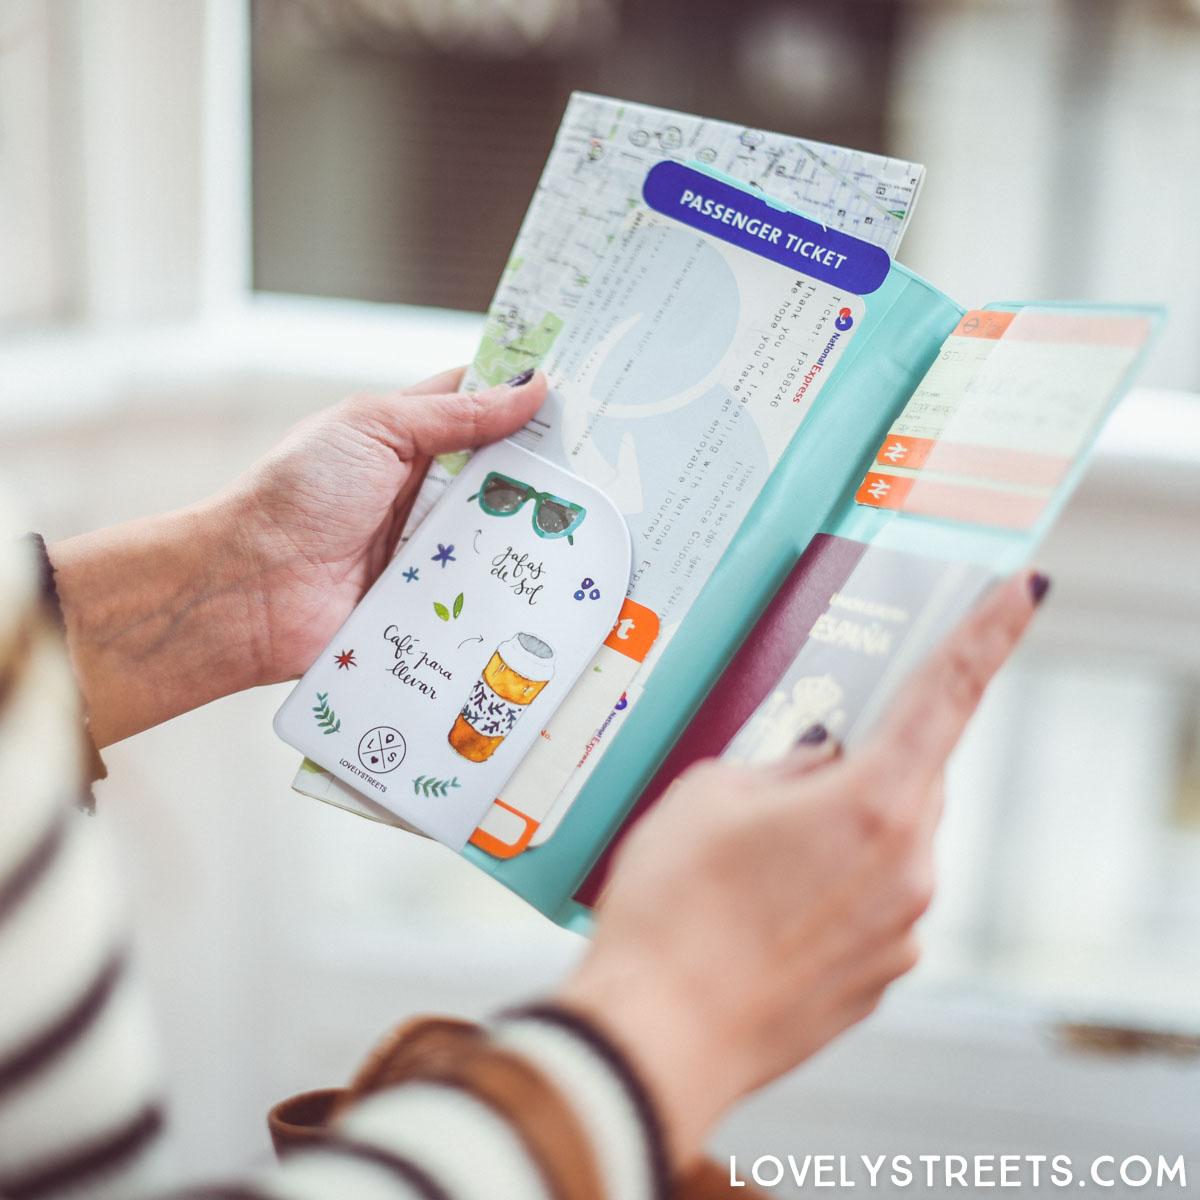 lovelystreets_portadocumentos-viaje-01_portadocumentos-viaje-lovelystreets-vivir-millon-aventuras-4